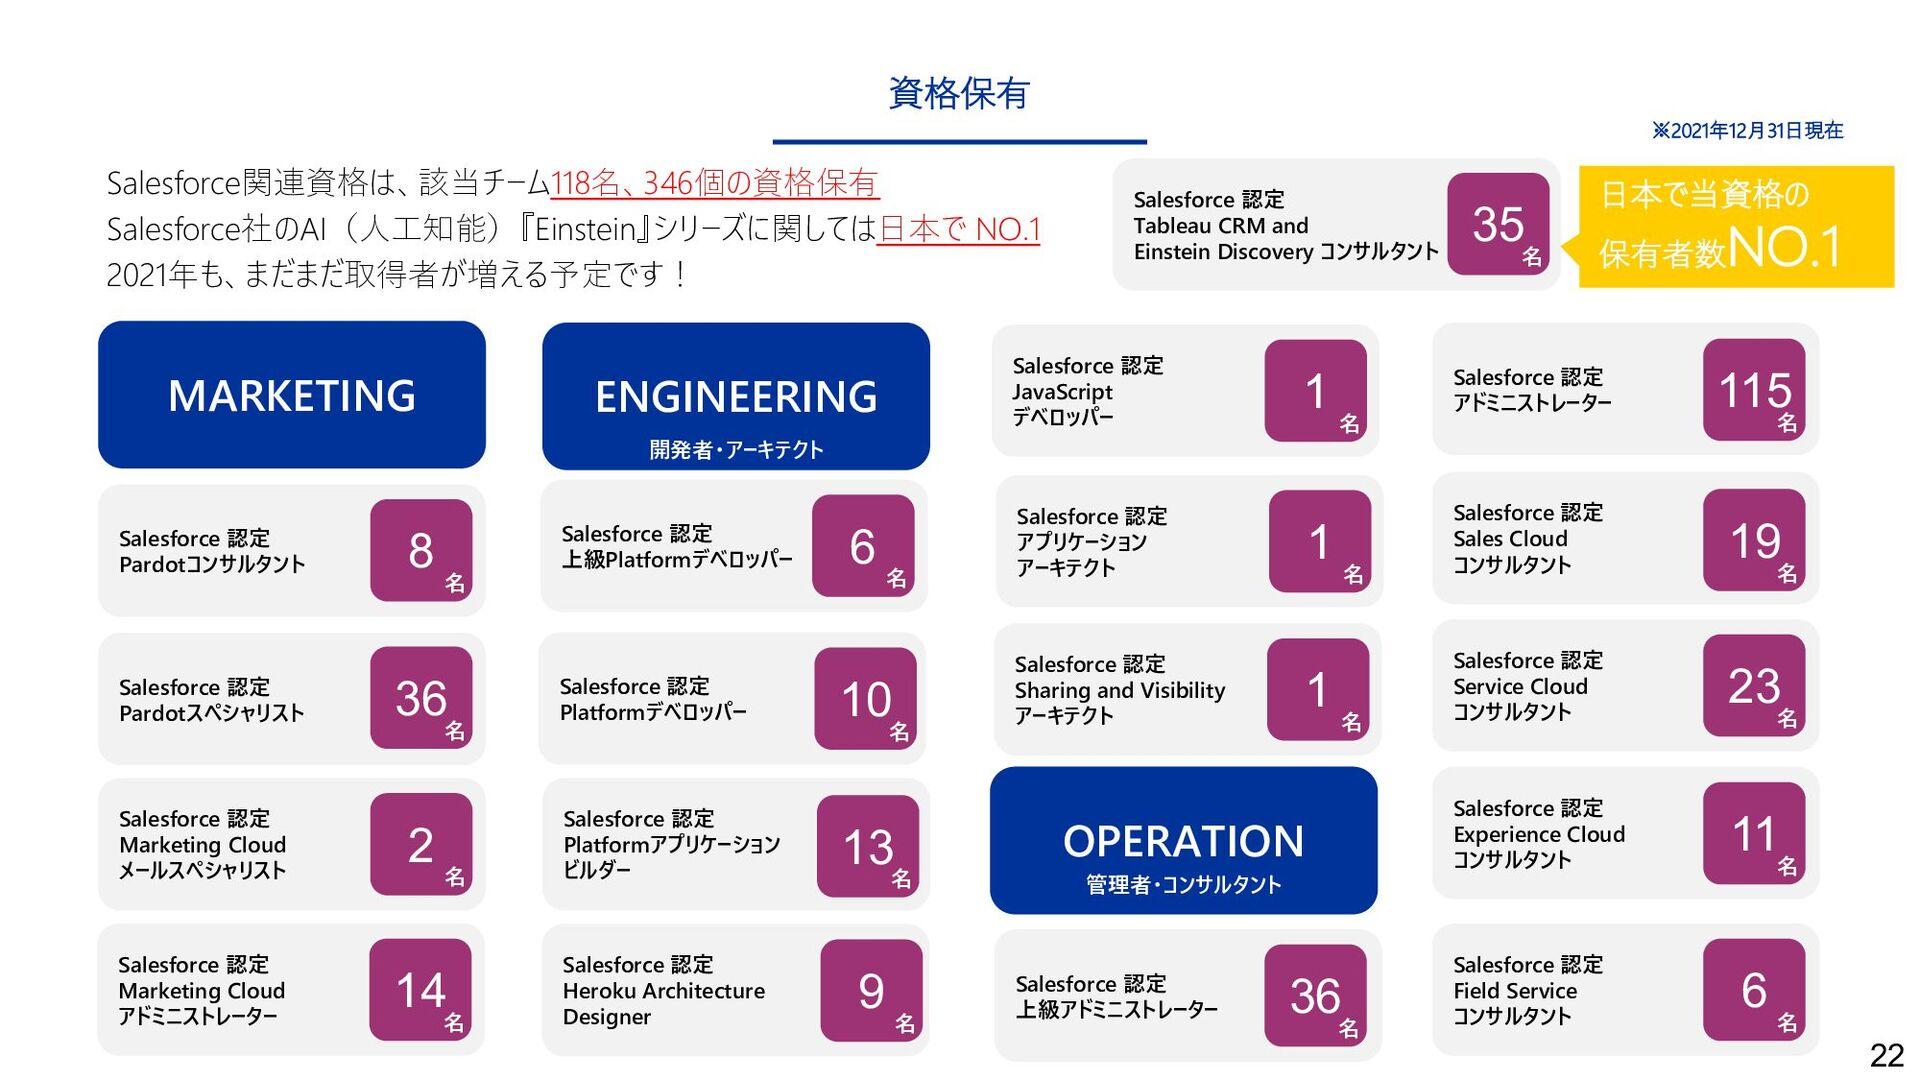 Salesforce 認定 Field Service コンサルタント 22 Salesfor...